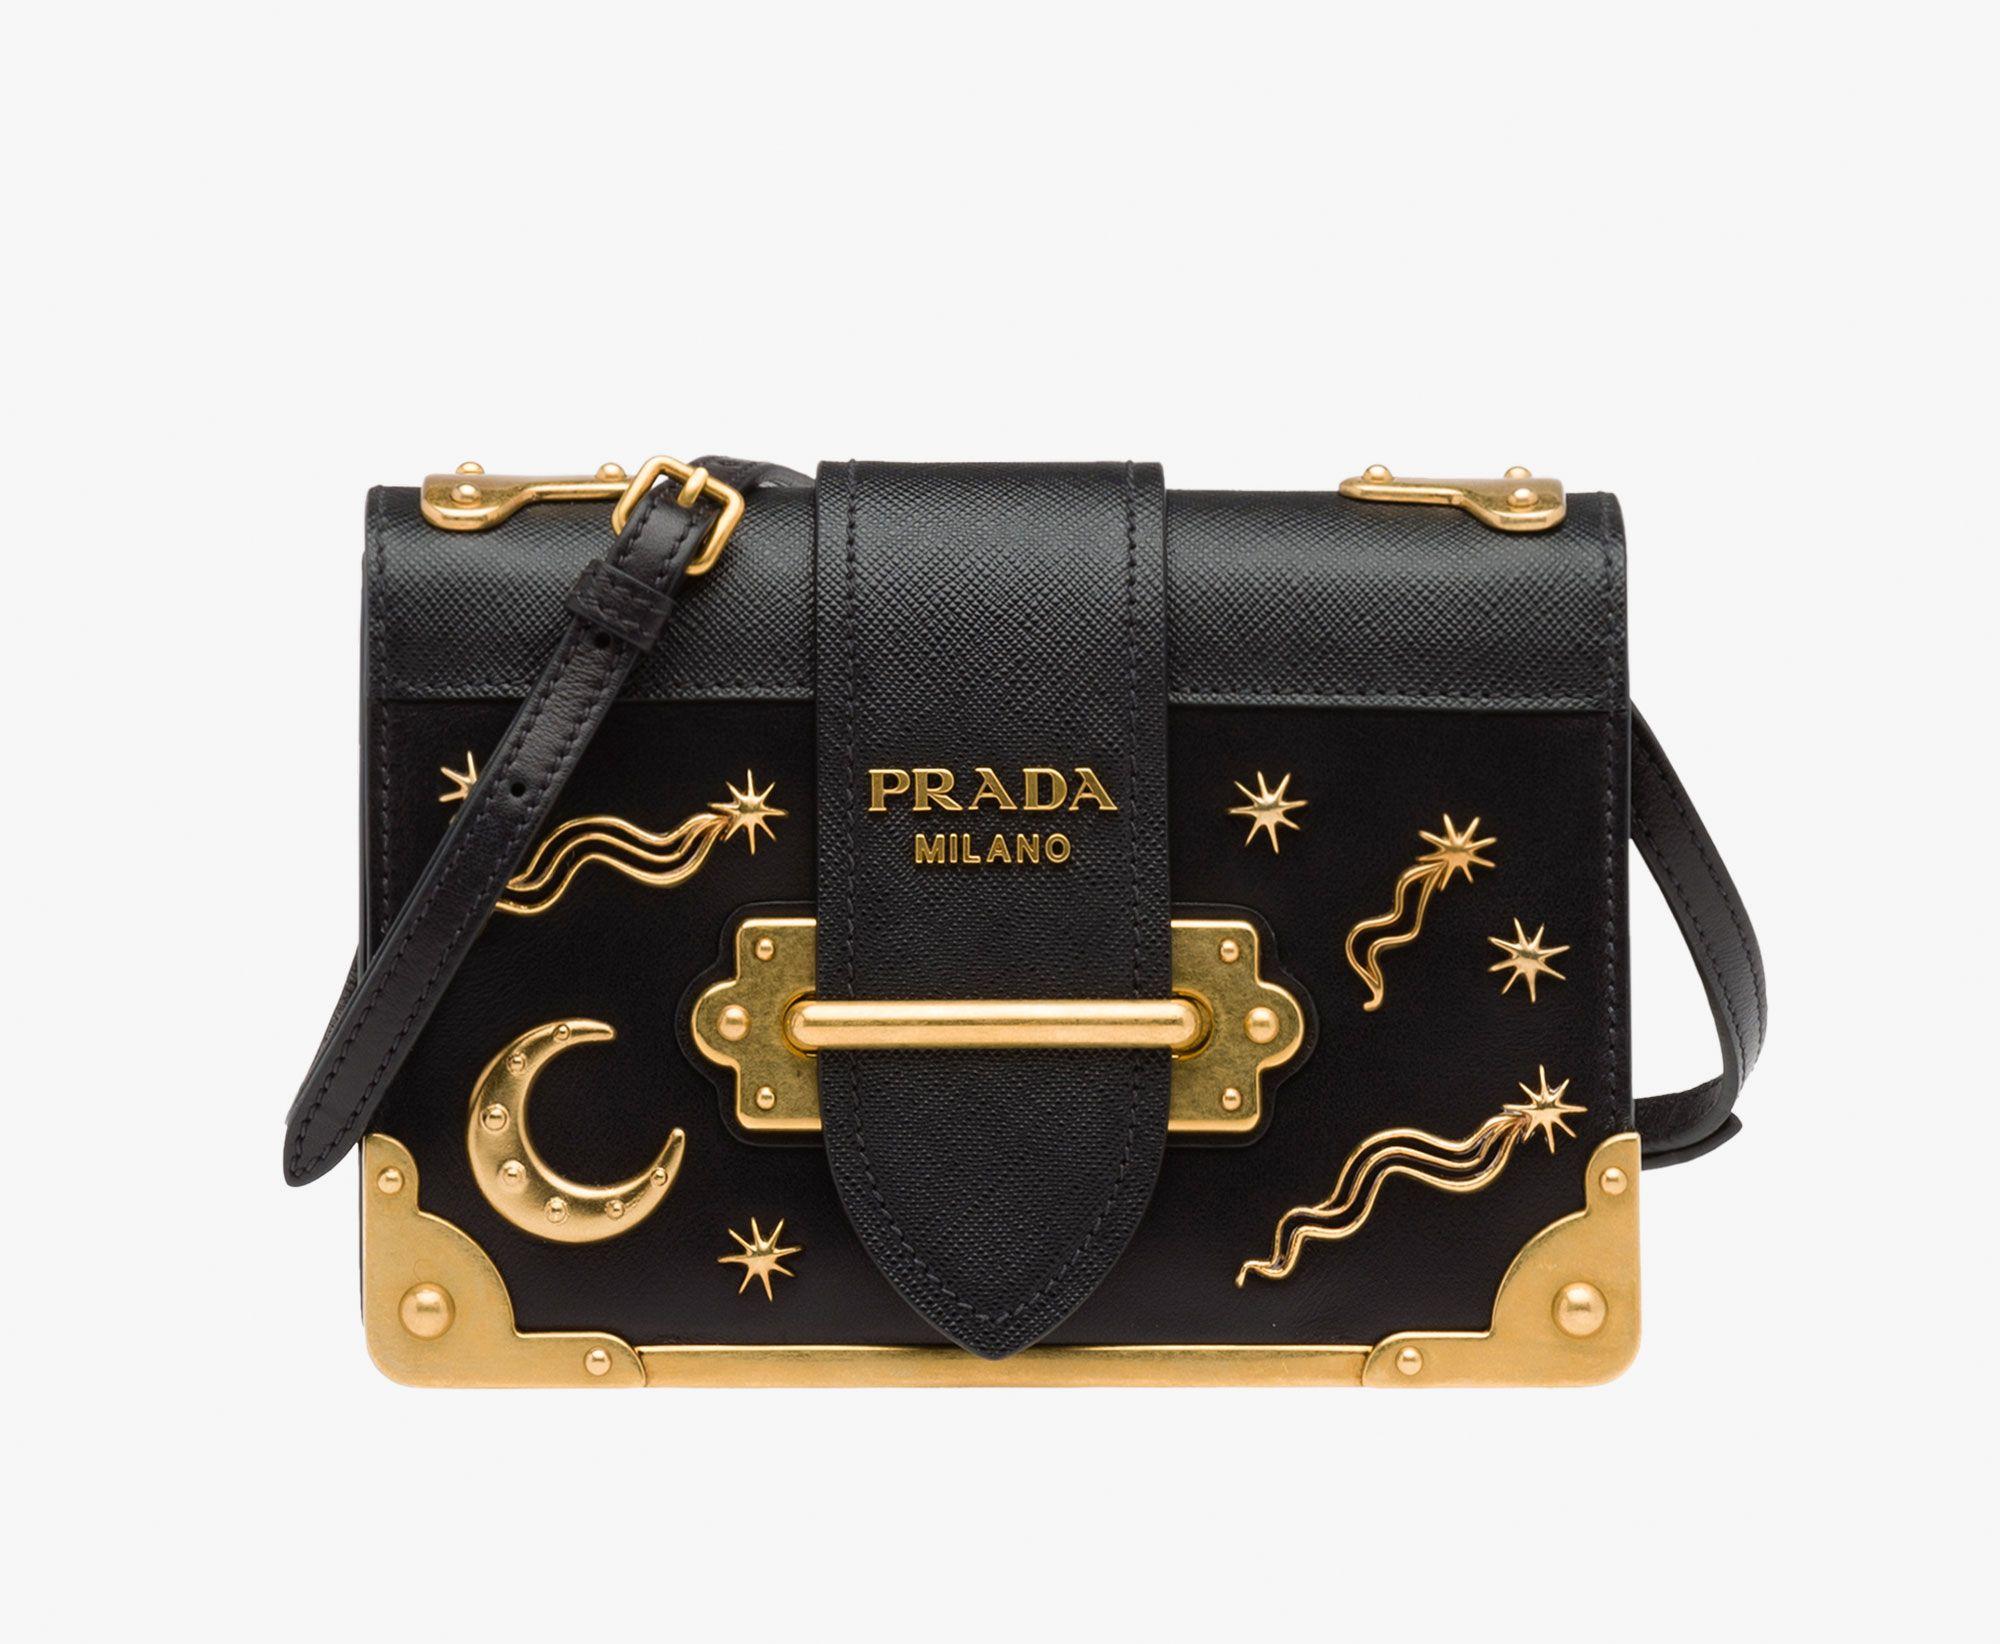 6f1f66d2c0 Prada 1BH018 Moon x Stars Cahier Bag In Black